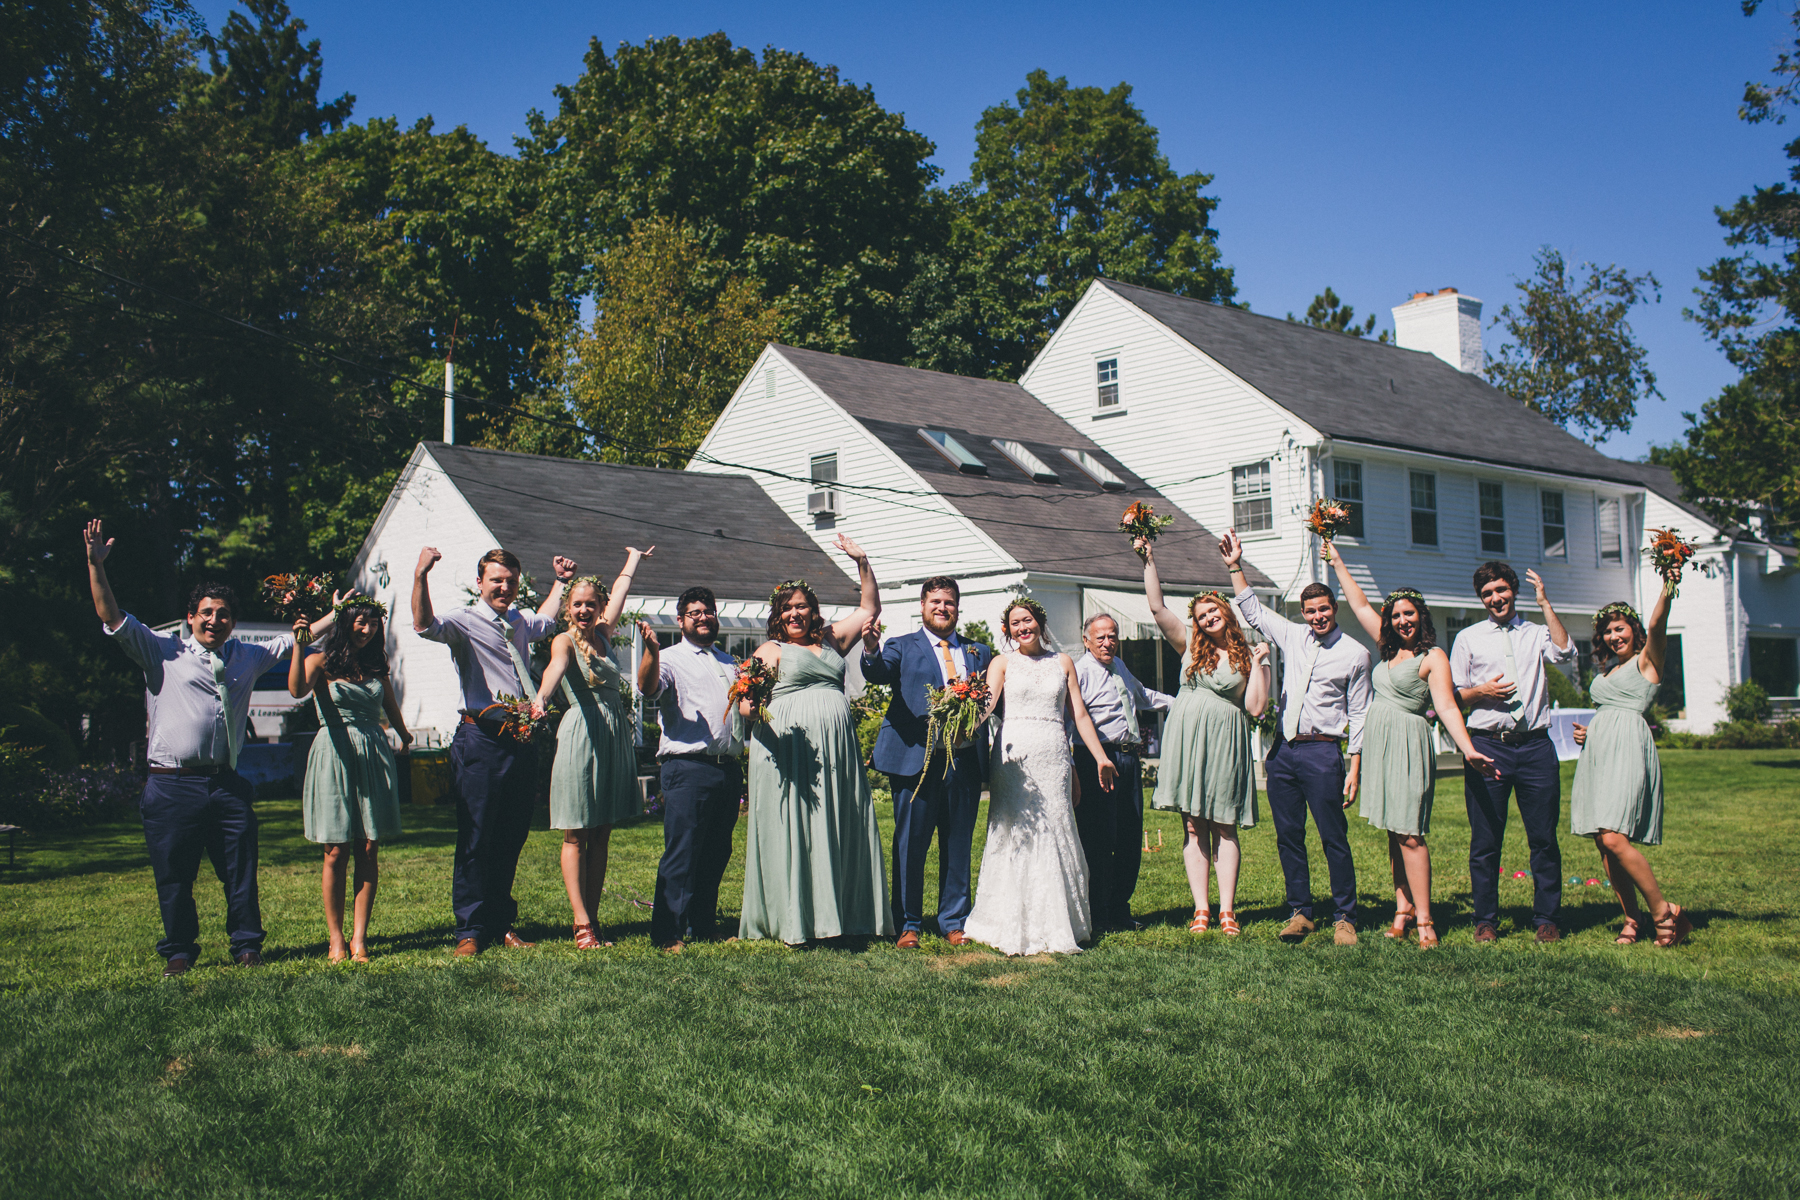 Long-Island-Documentary-Wedding-Photography-Summer-Tent-Wedding-in-New-York-51.jpg